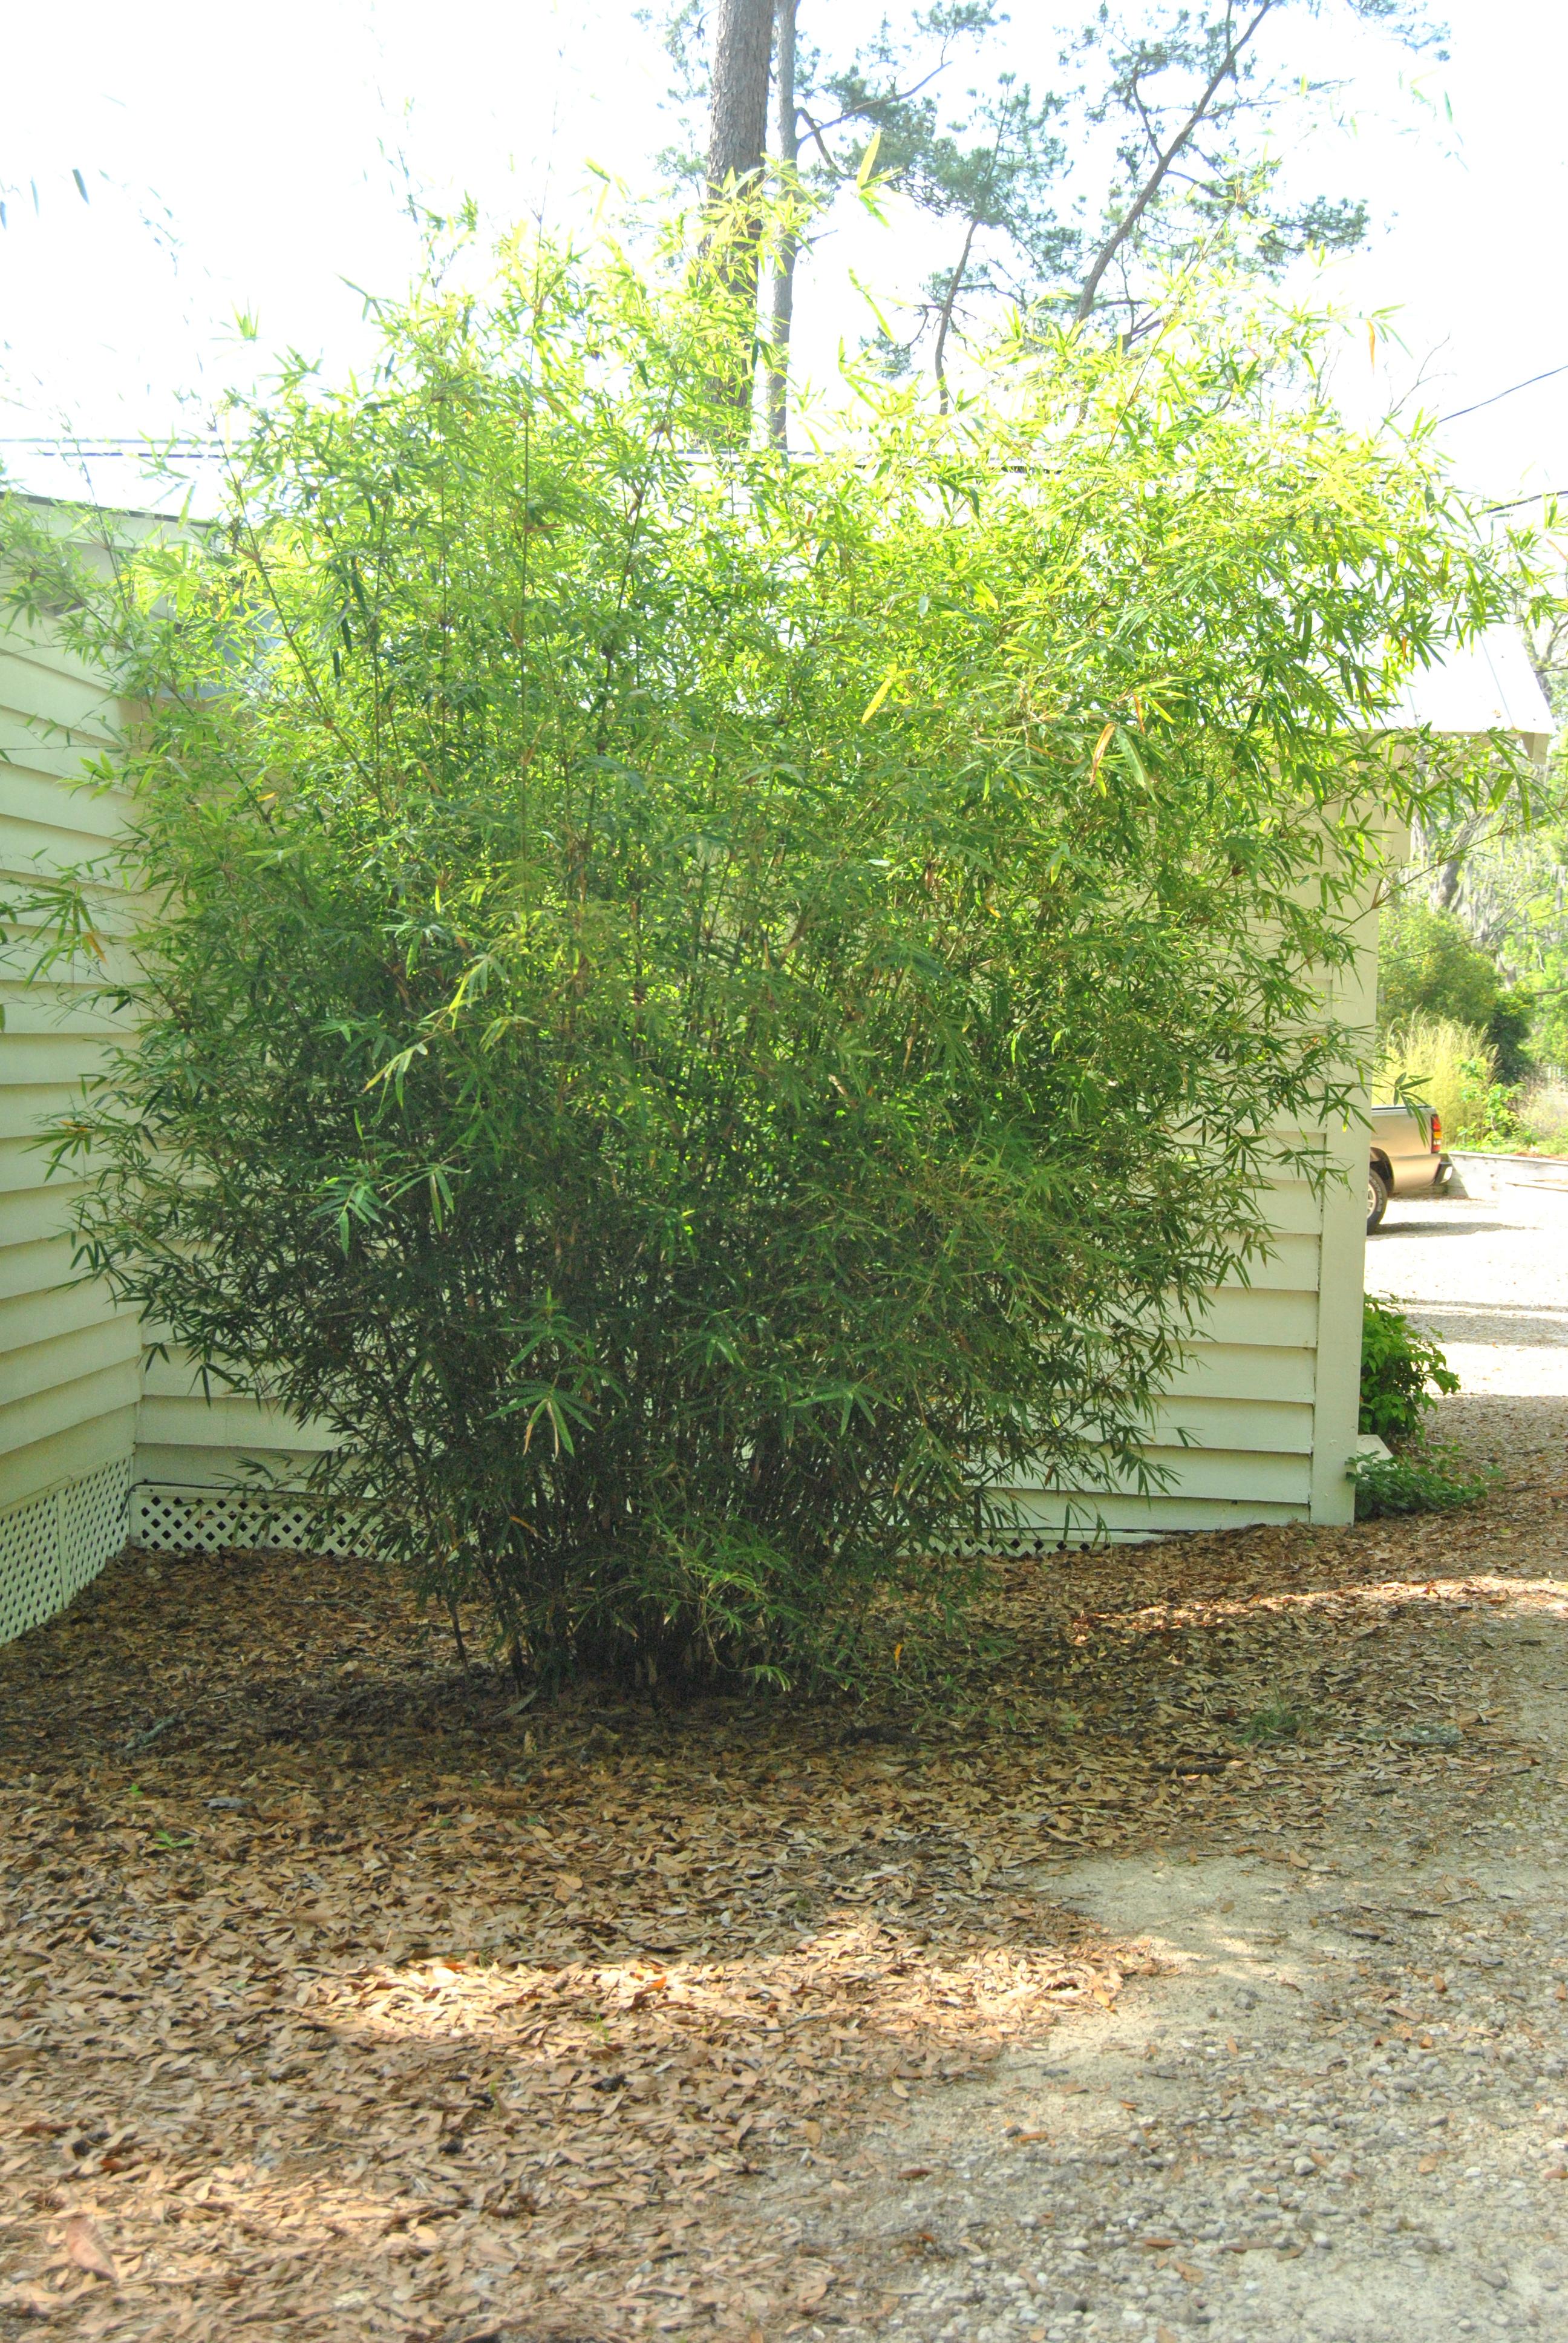 NON-INVASIVE CLUMPING BAMBOOS | Thigpen Trail Bamboo Farm